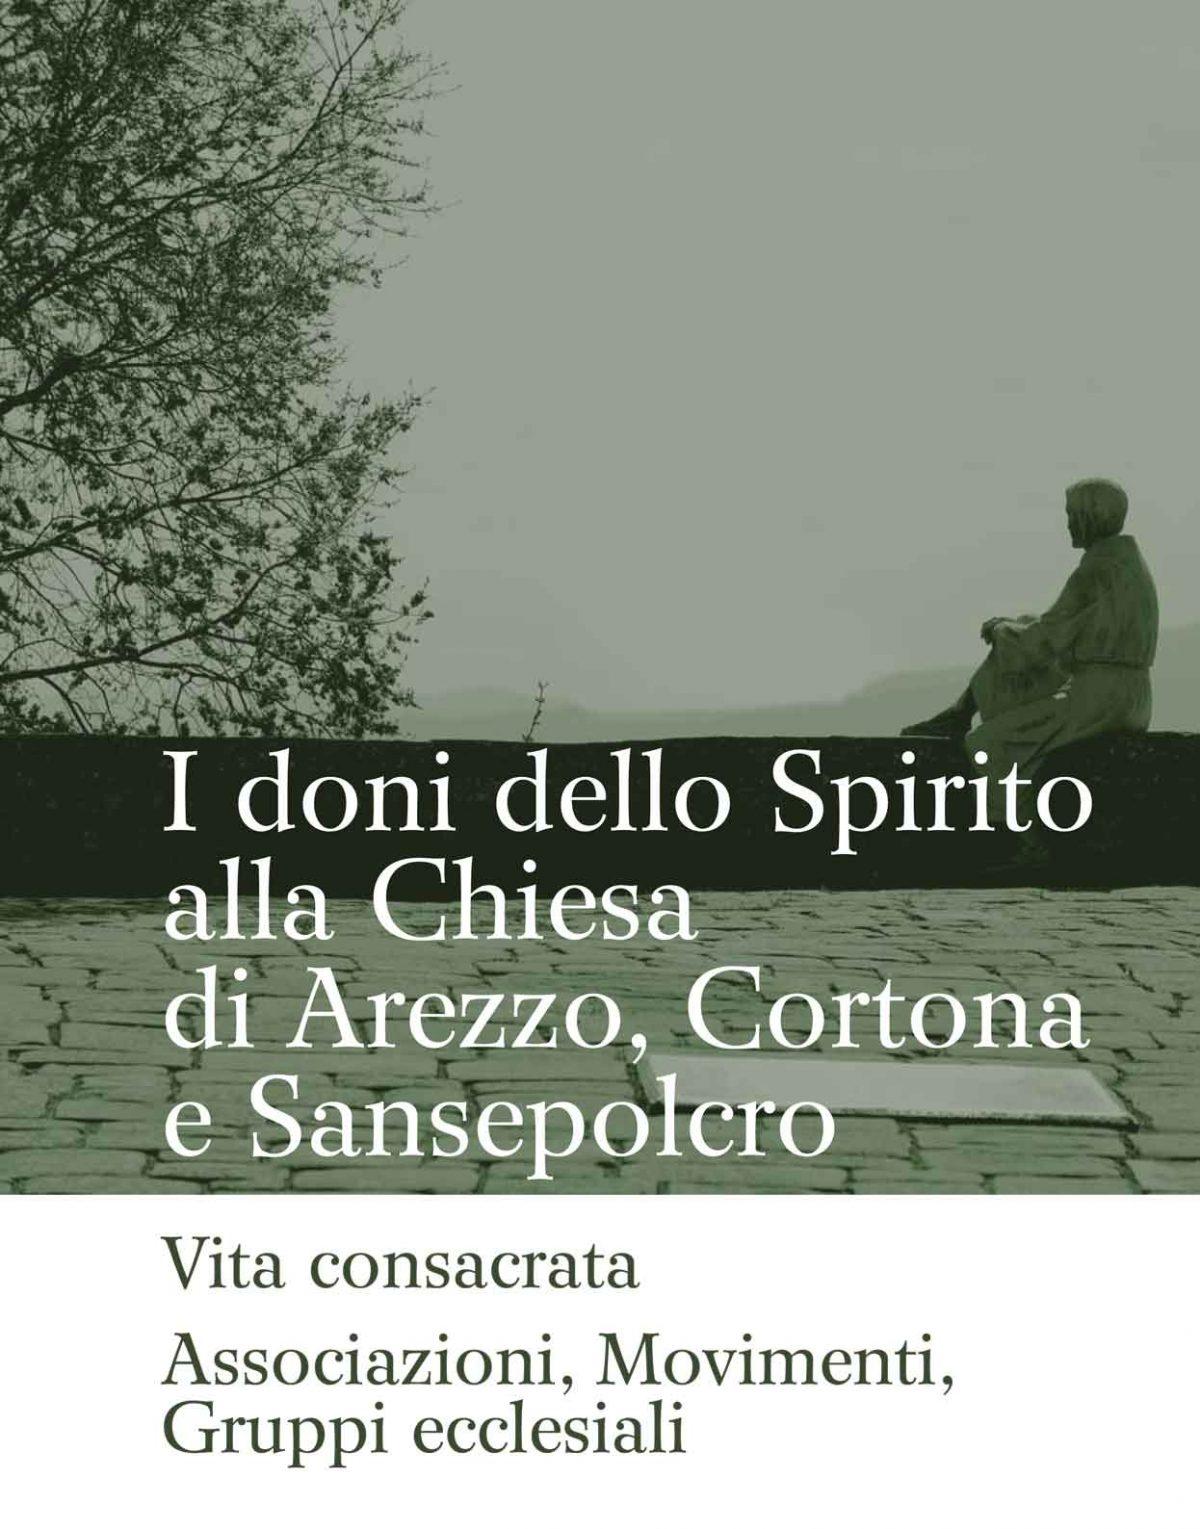 Copertina-I-doni-dello-Spirito